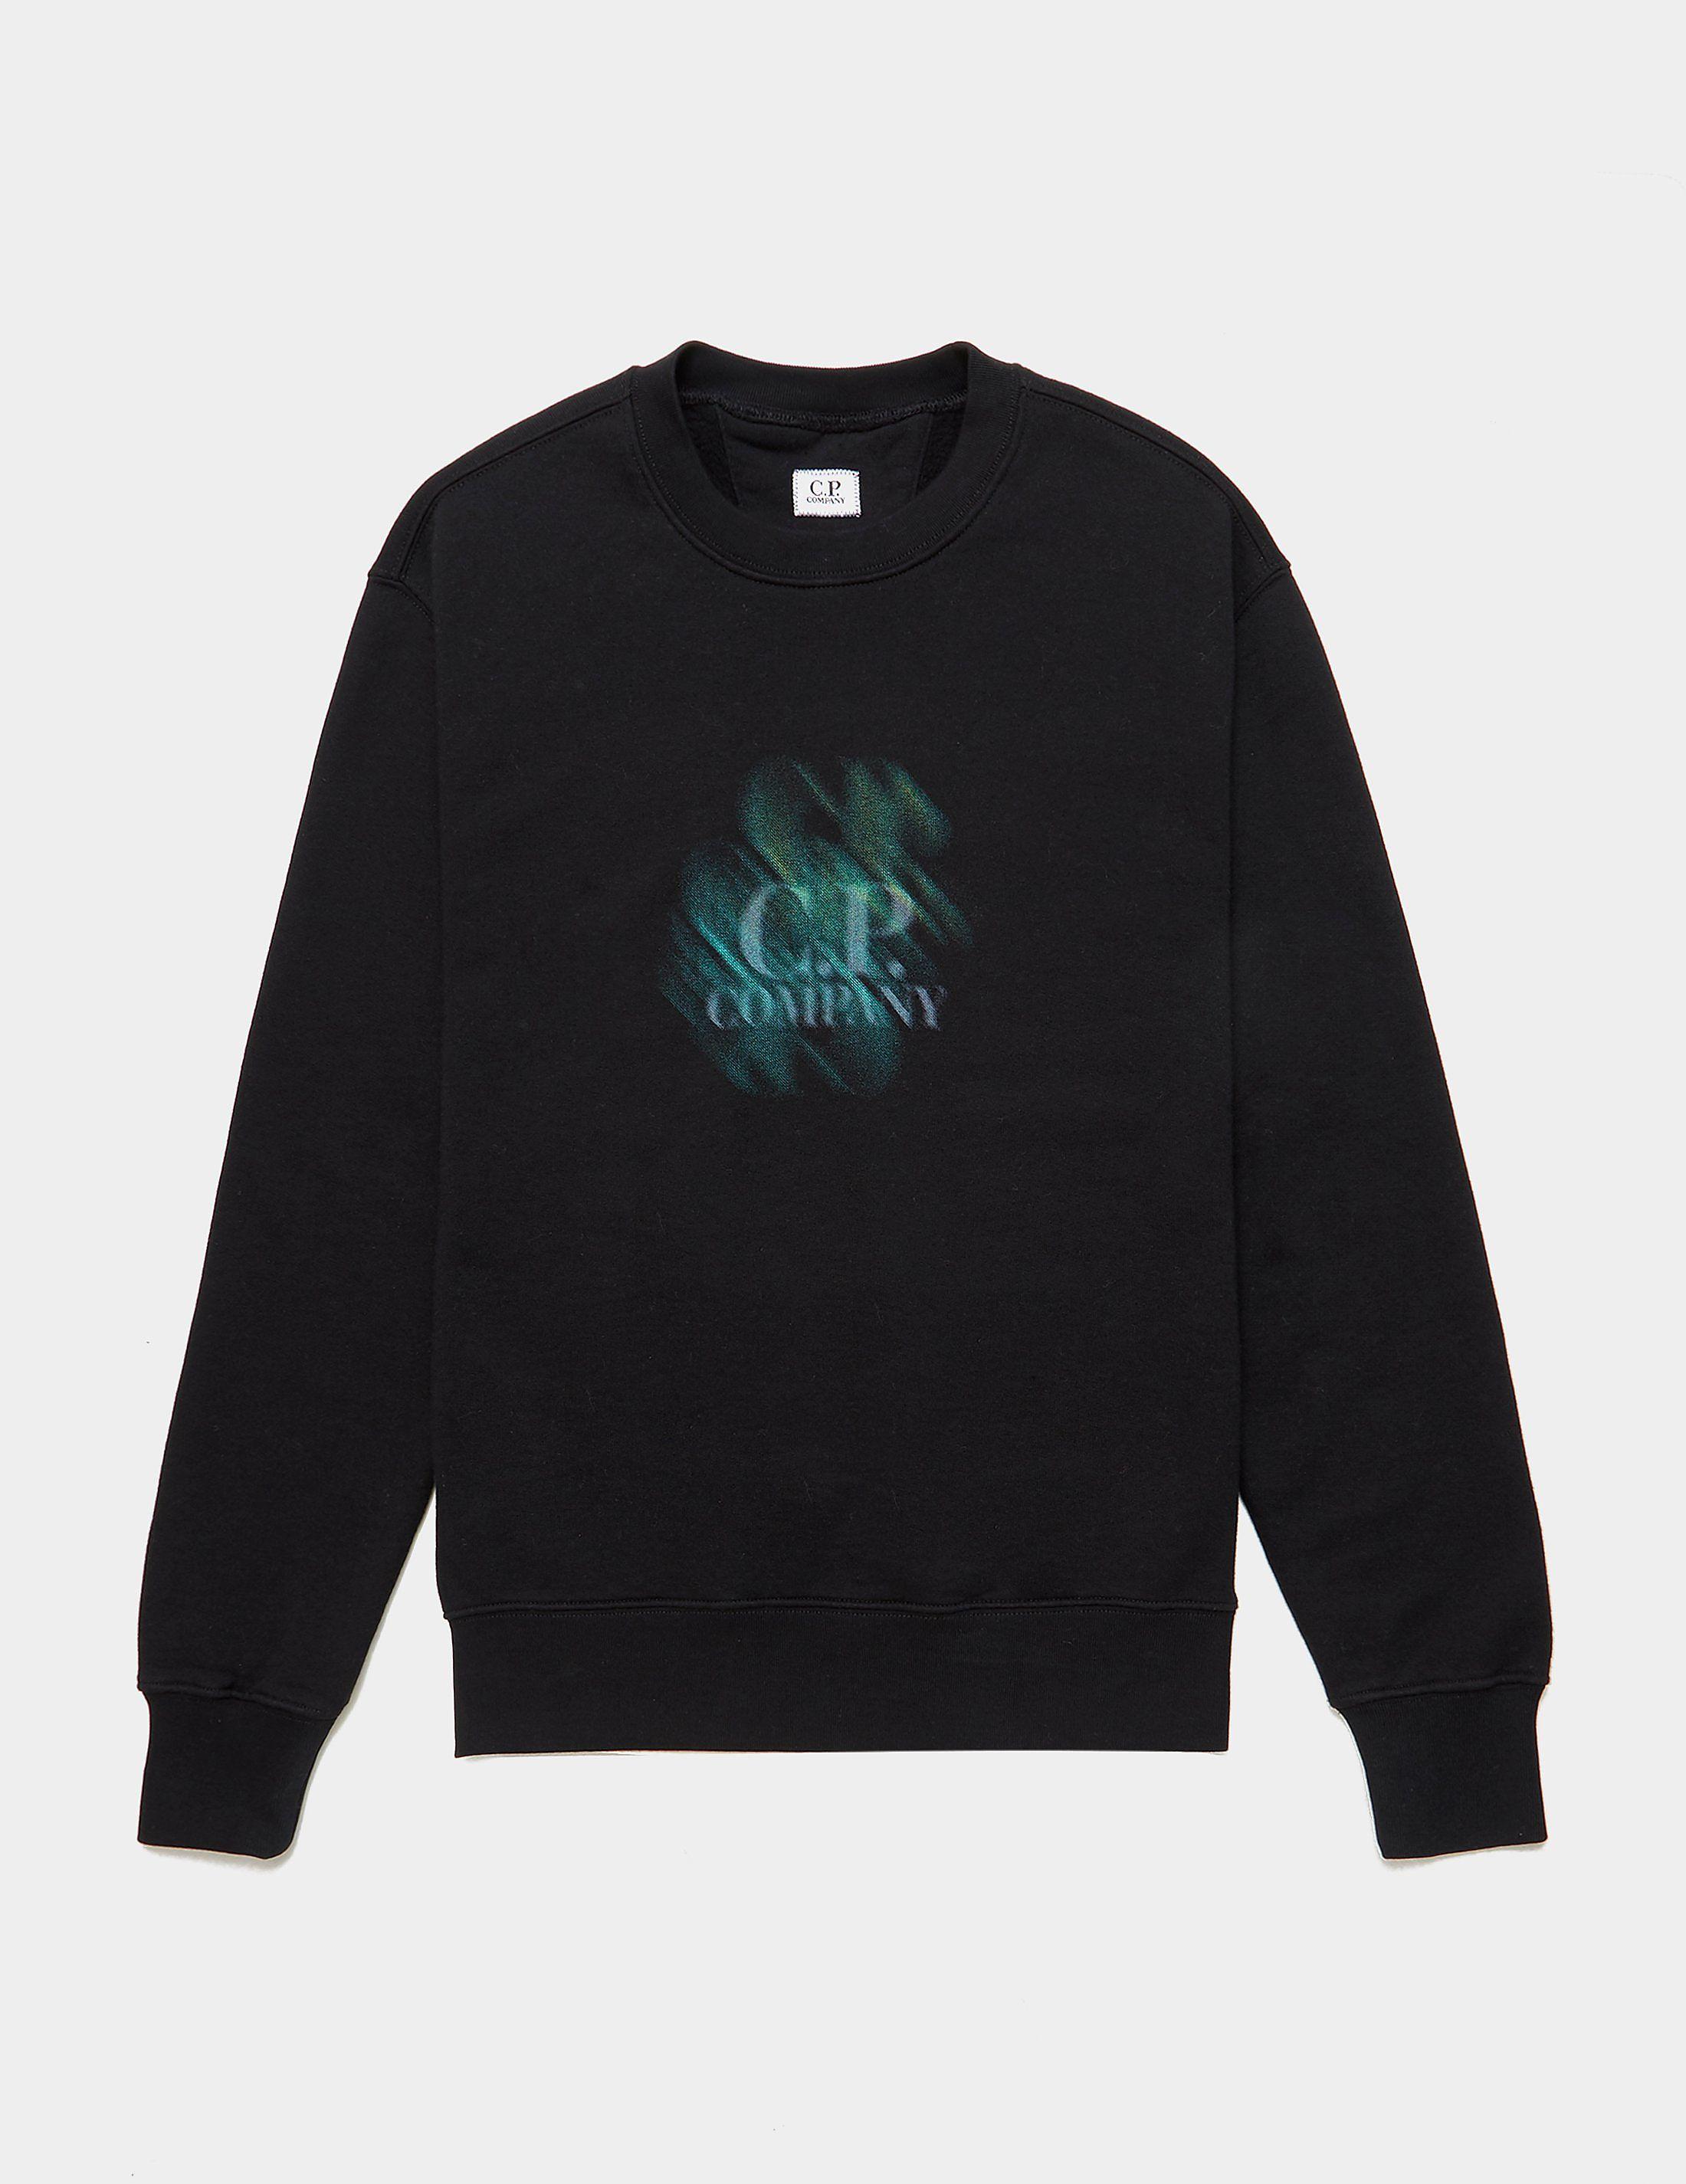 CP Company Blur Logo Sweatshirt | Tessuti